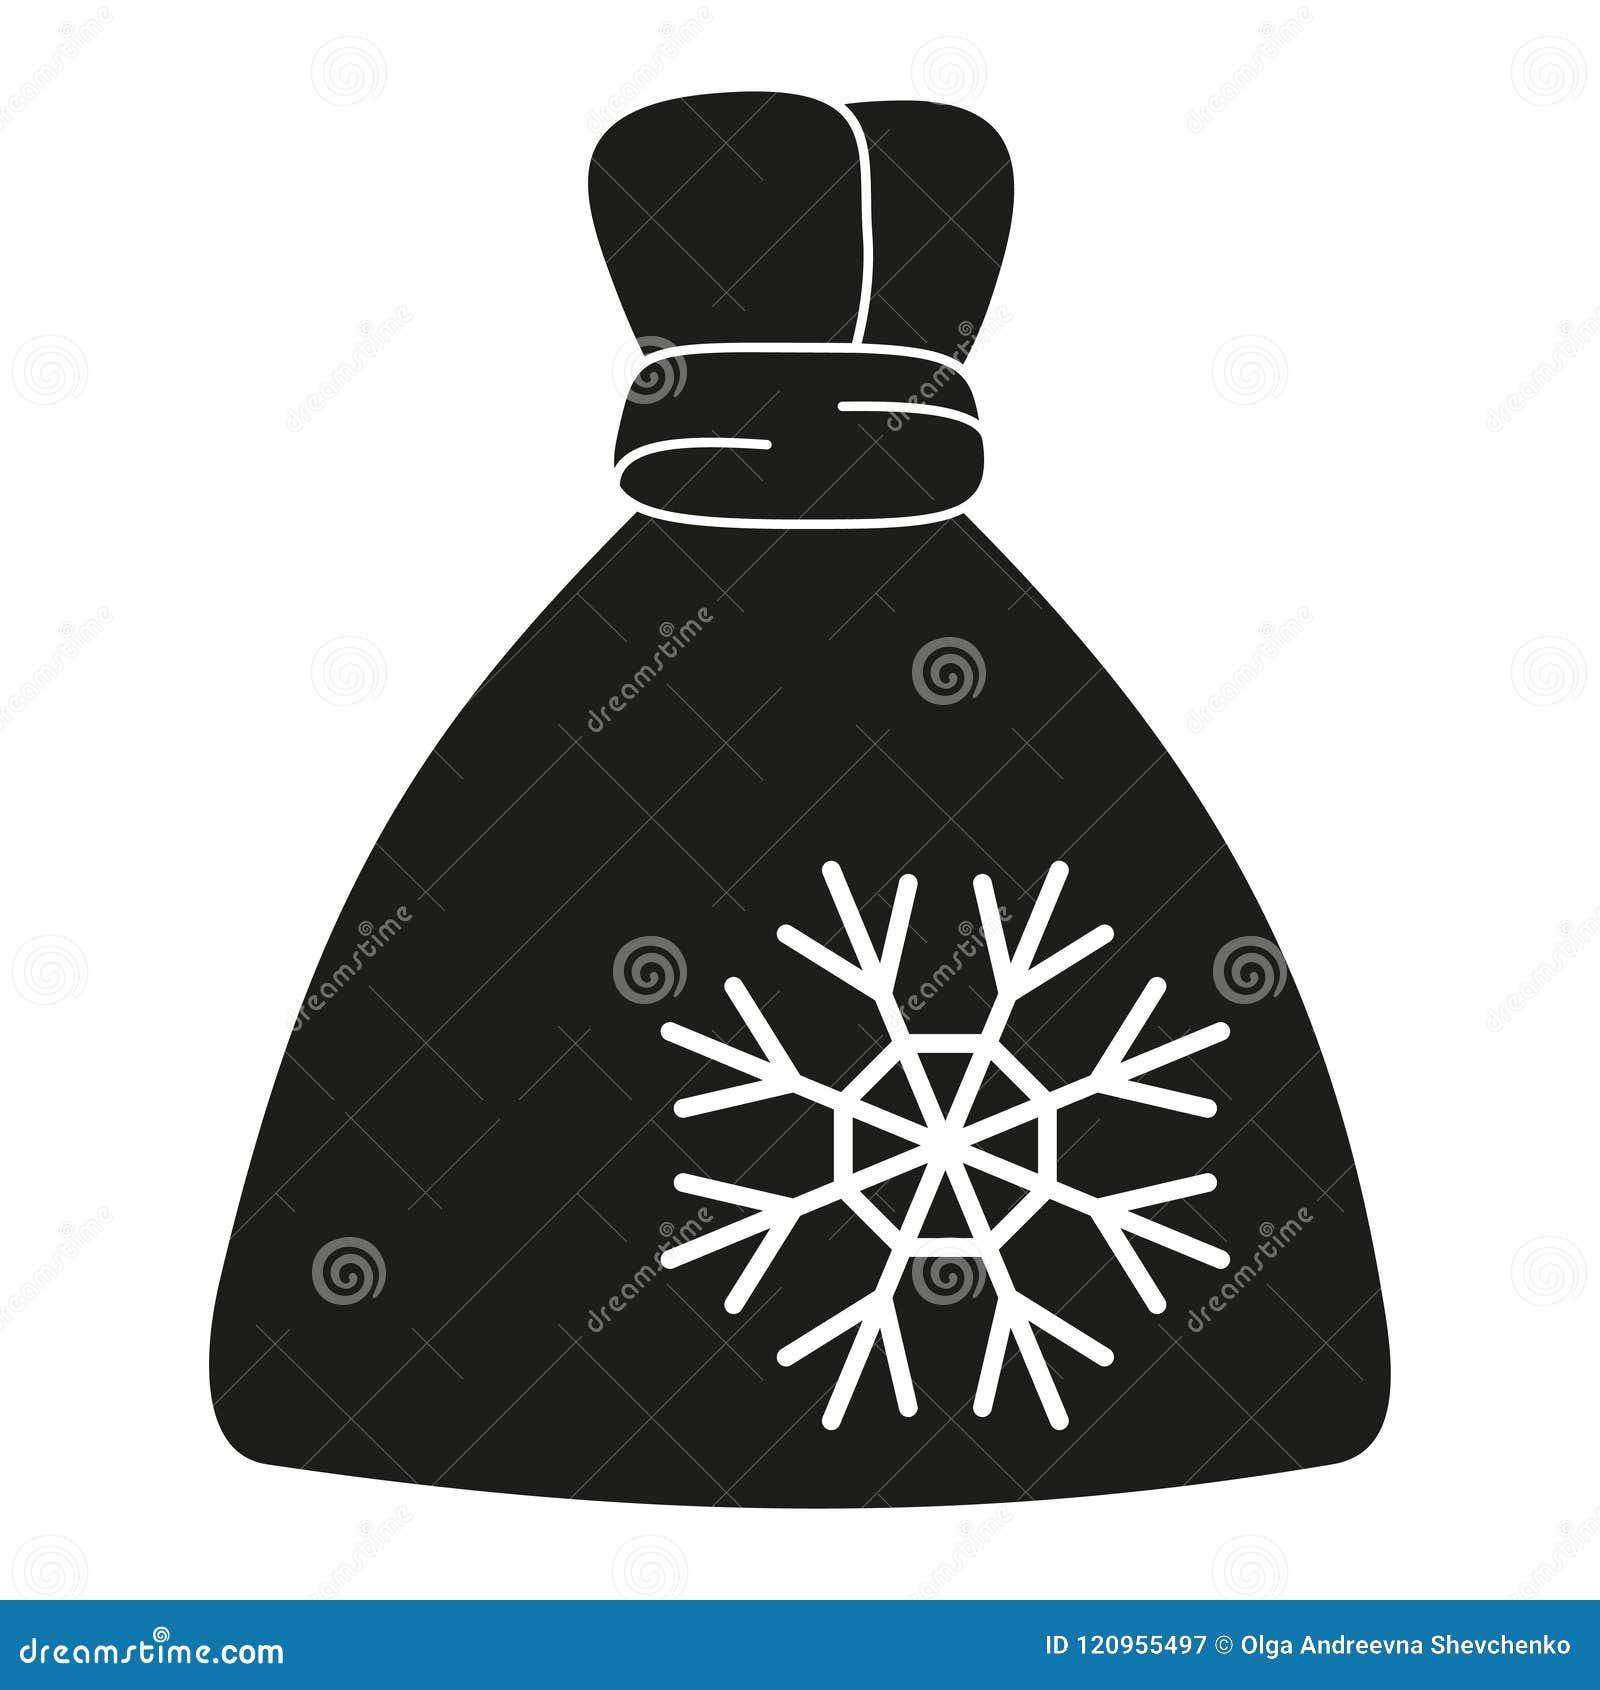 Black And White Xmas Gift Bag Silhouette Stock Vector Illustration Of Printable Full 120955497